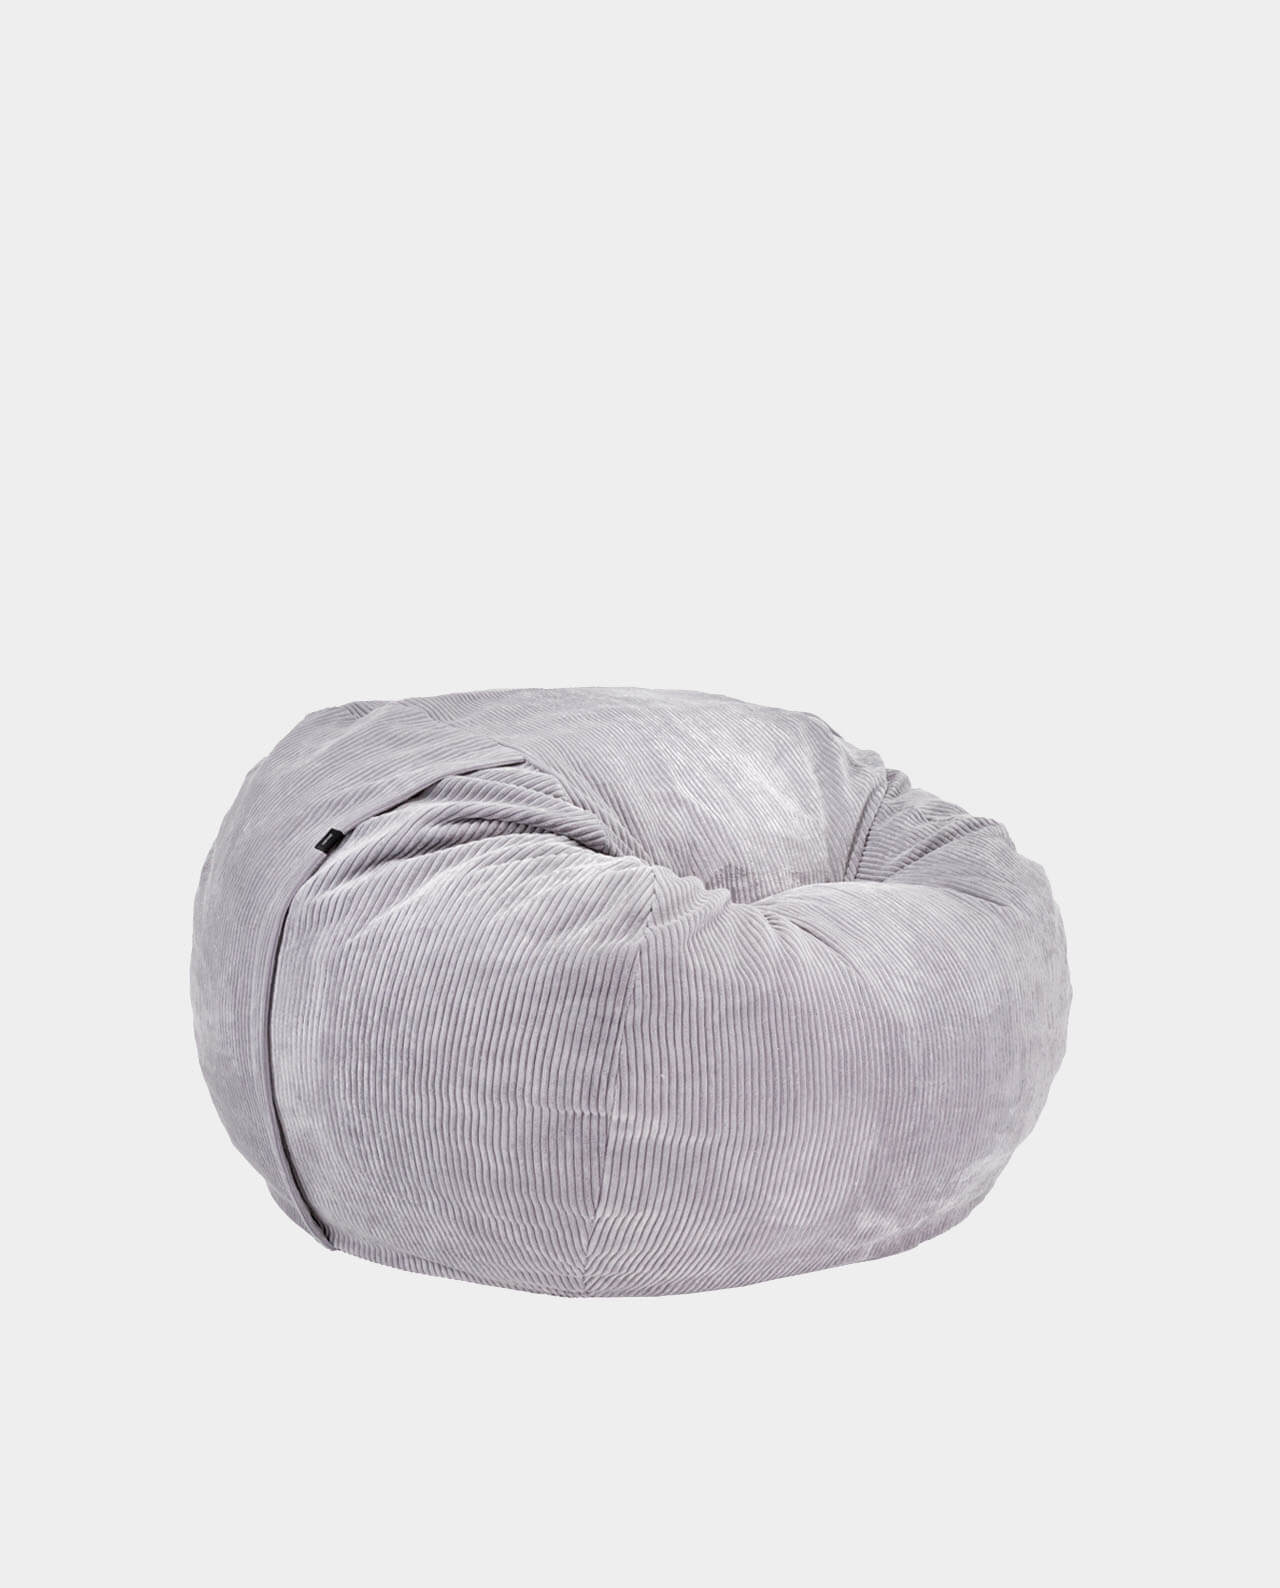 sitzsack platinum bewertung grijzemuren. Black Bedroom Furniture Sets. Home Design Ideas